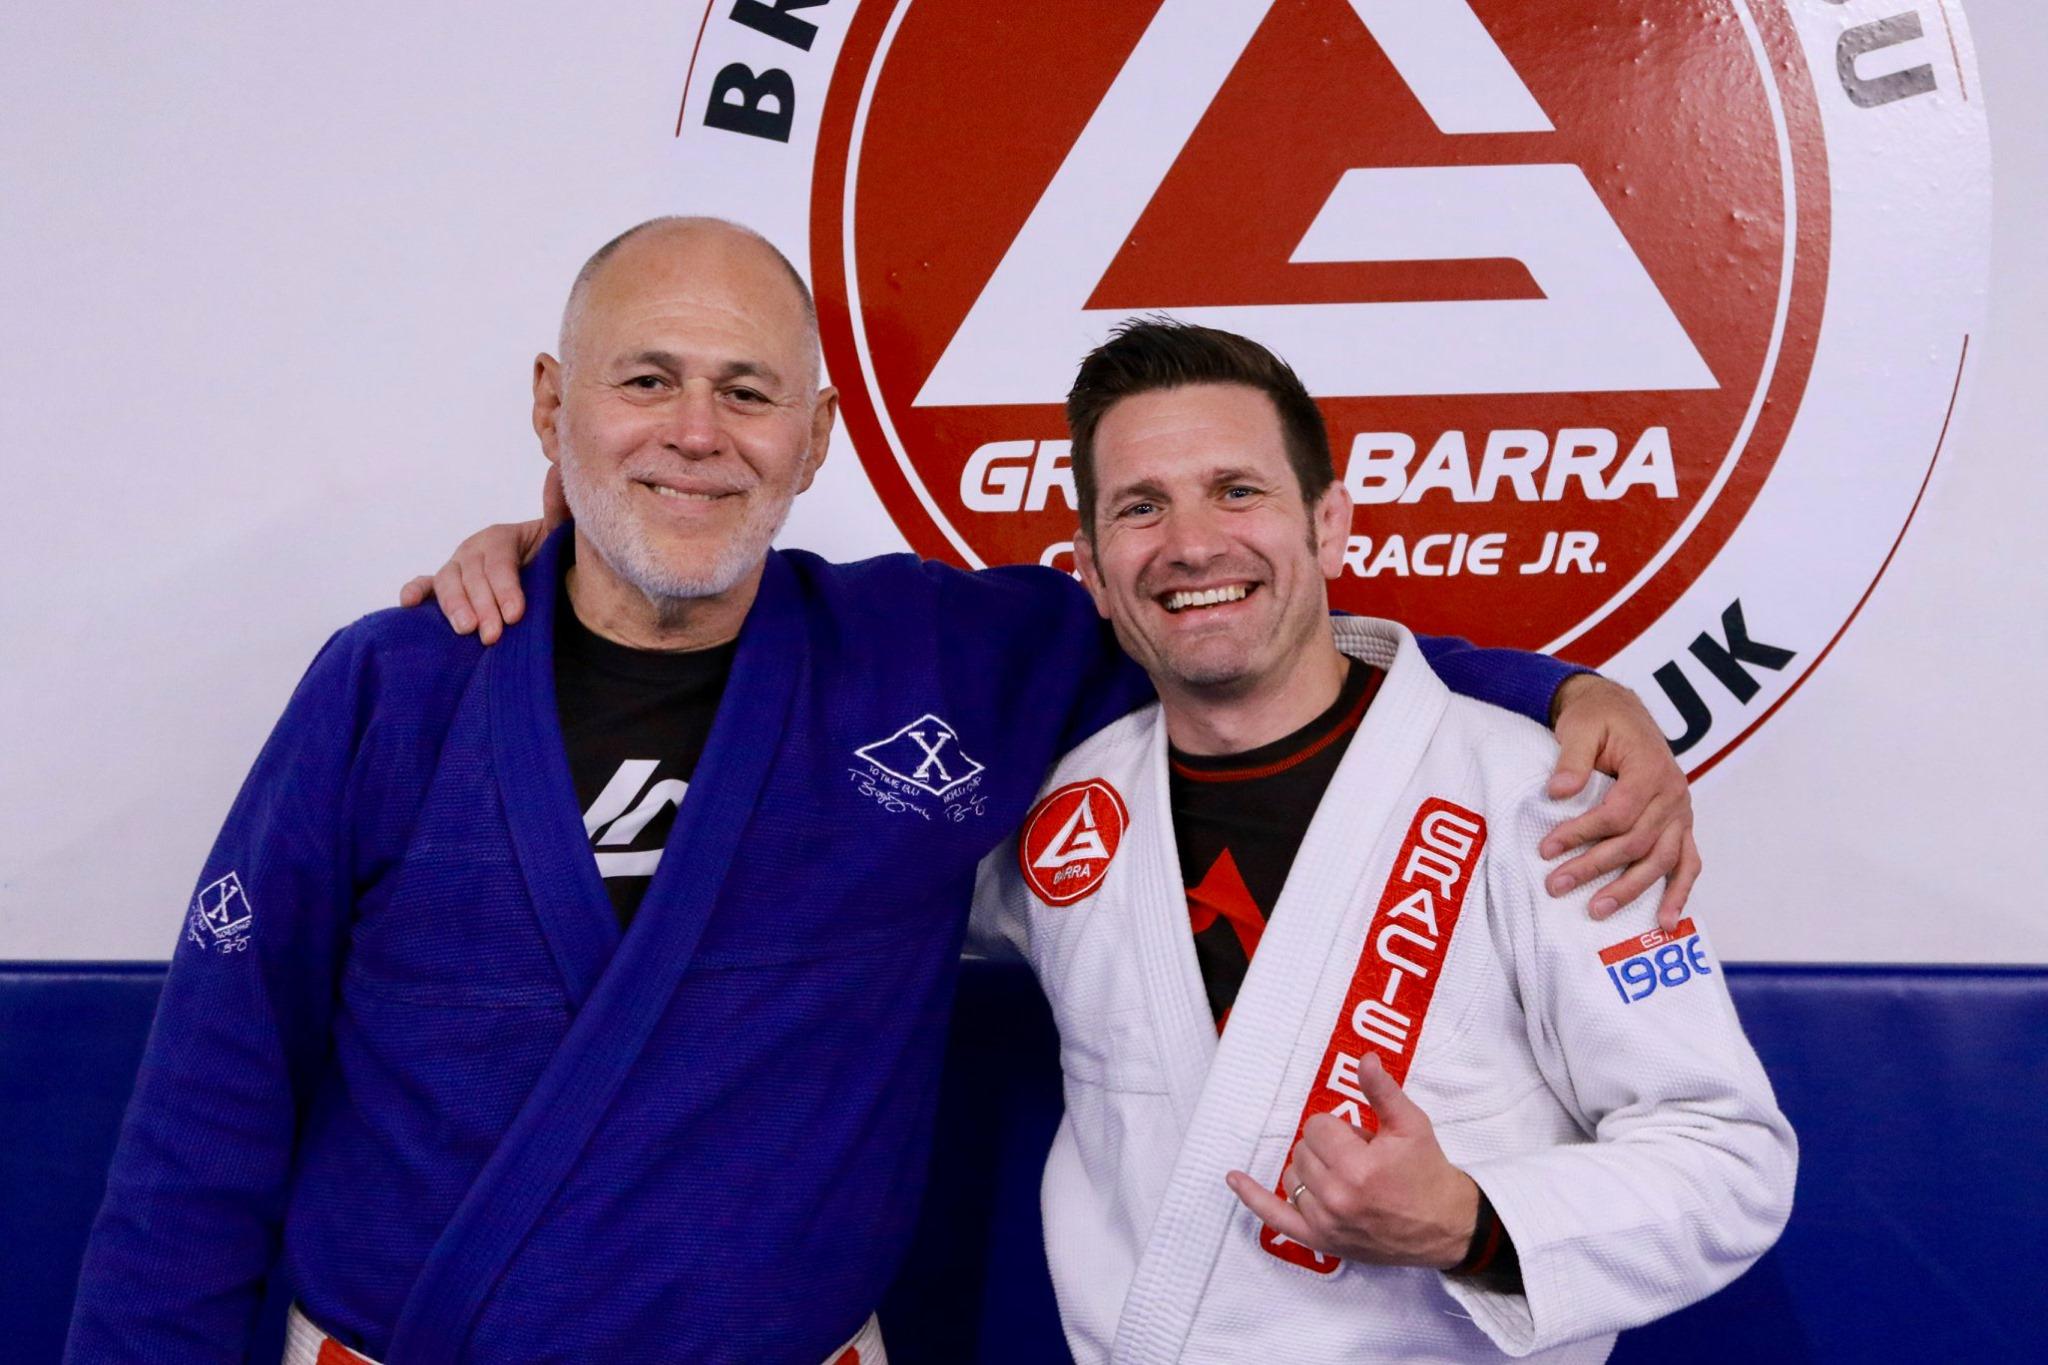 Mauricio Gomes (left) and Paul Bridges